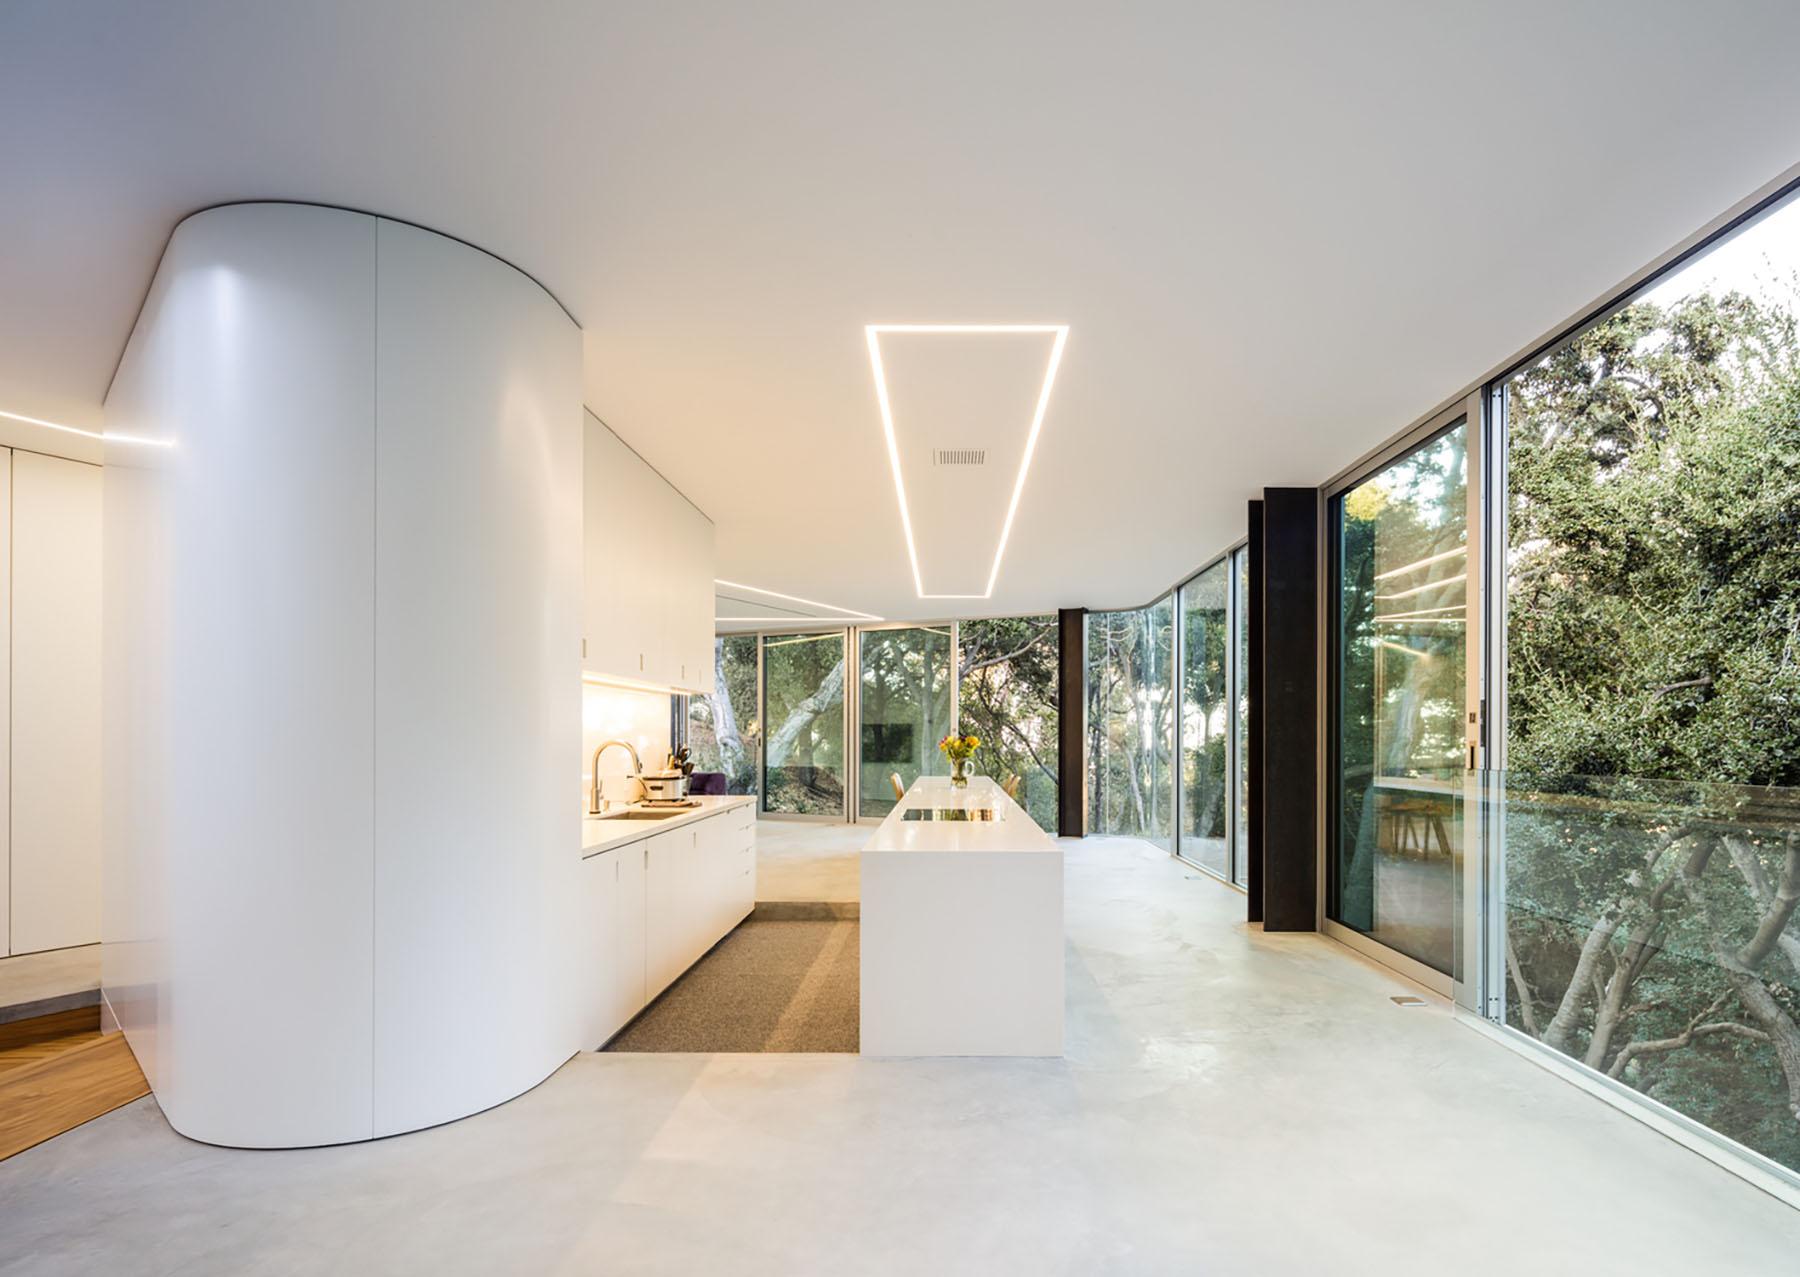 iGNANT-Architecture-Craig-Steely-Pam-Pauls-House-004b